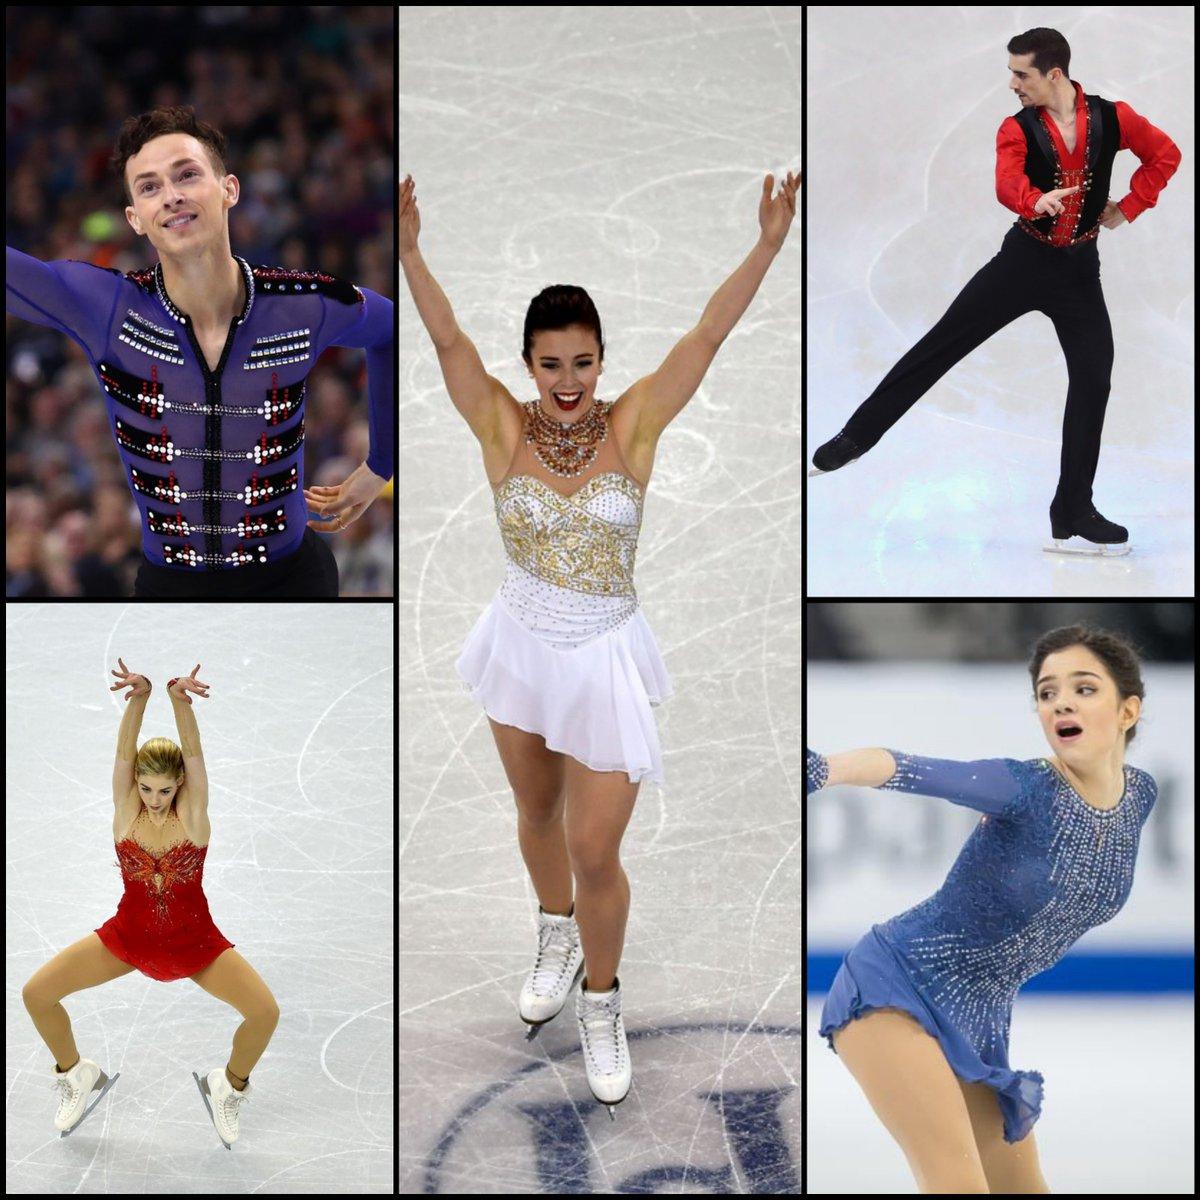 ICE STYLE: Costumes RECAP of #Worlds2016 ISU 2016 World Championships LADIES & MEN: https://t.co/Pn44zNn4qw https://t.co/EUgtTZZeB1